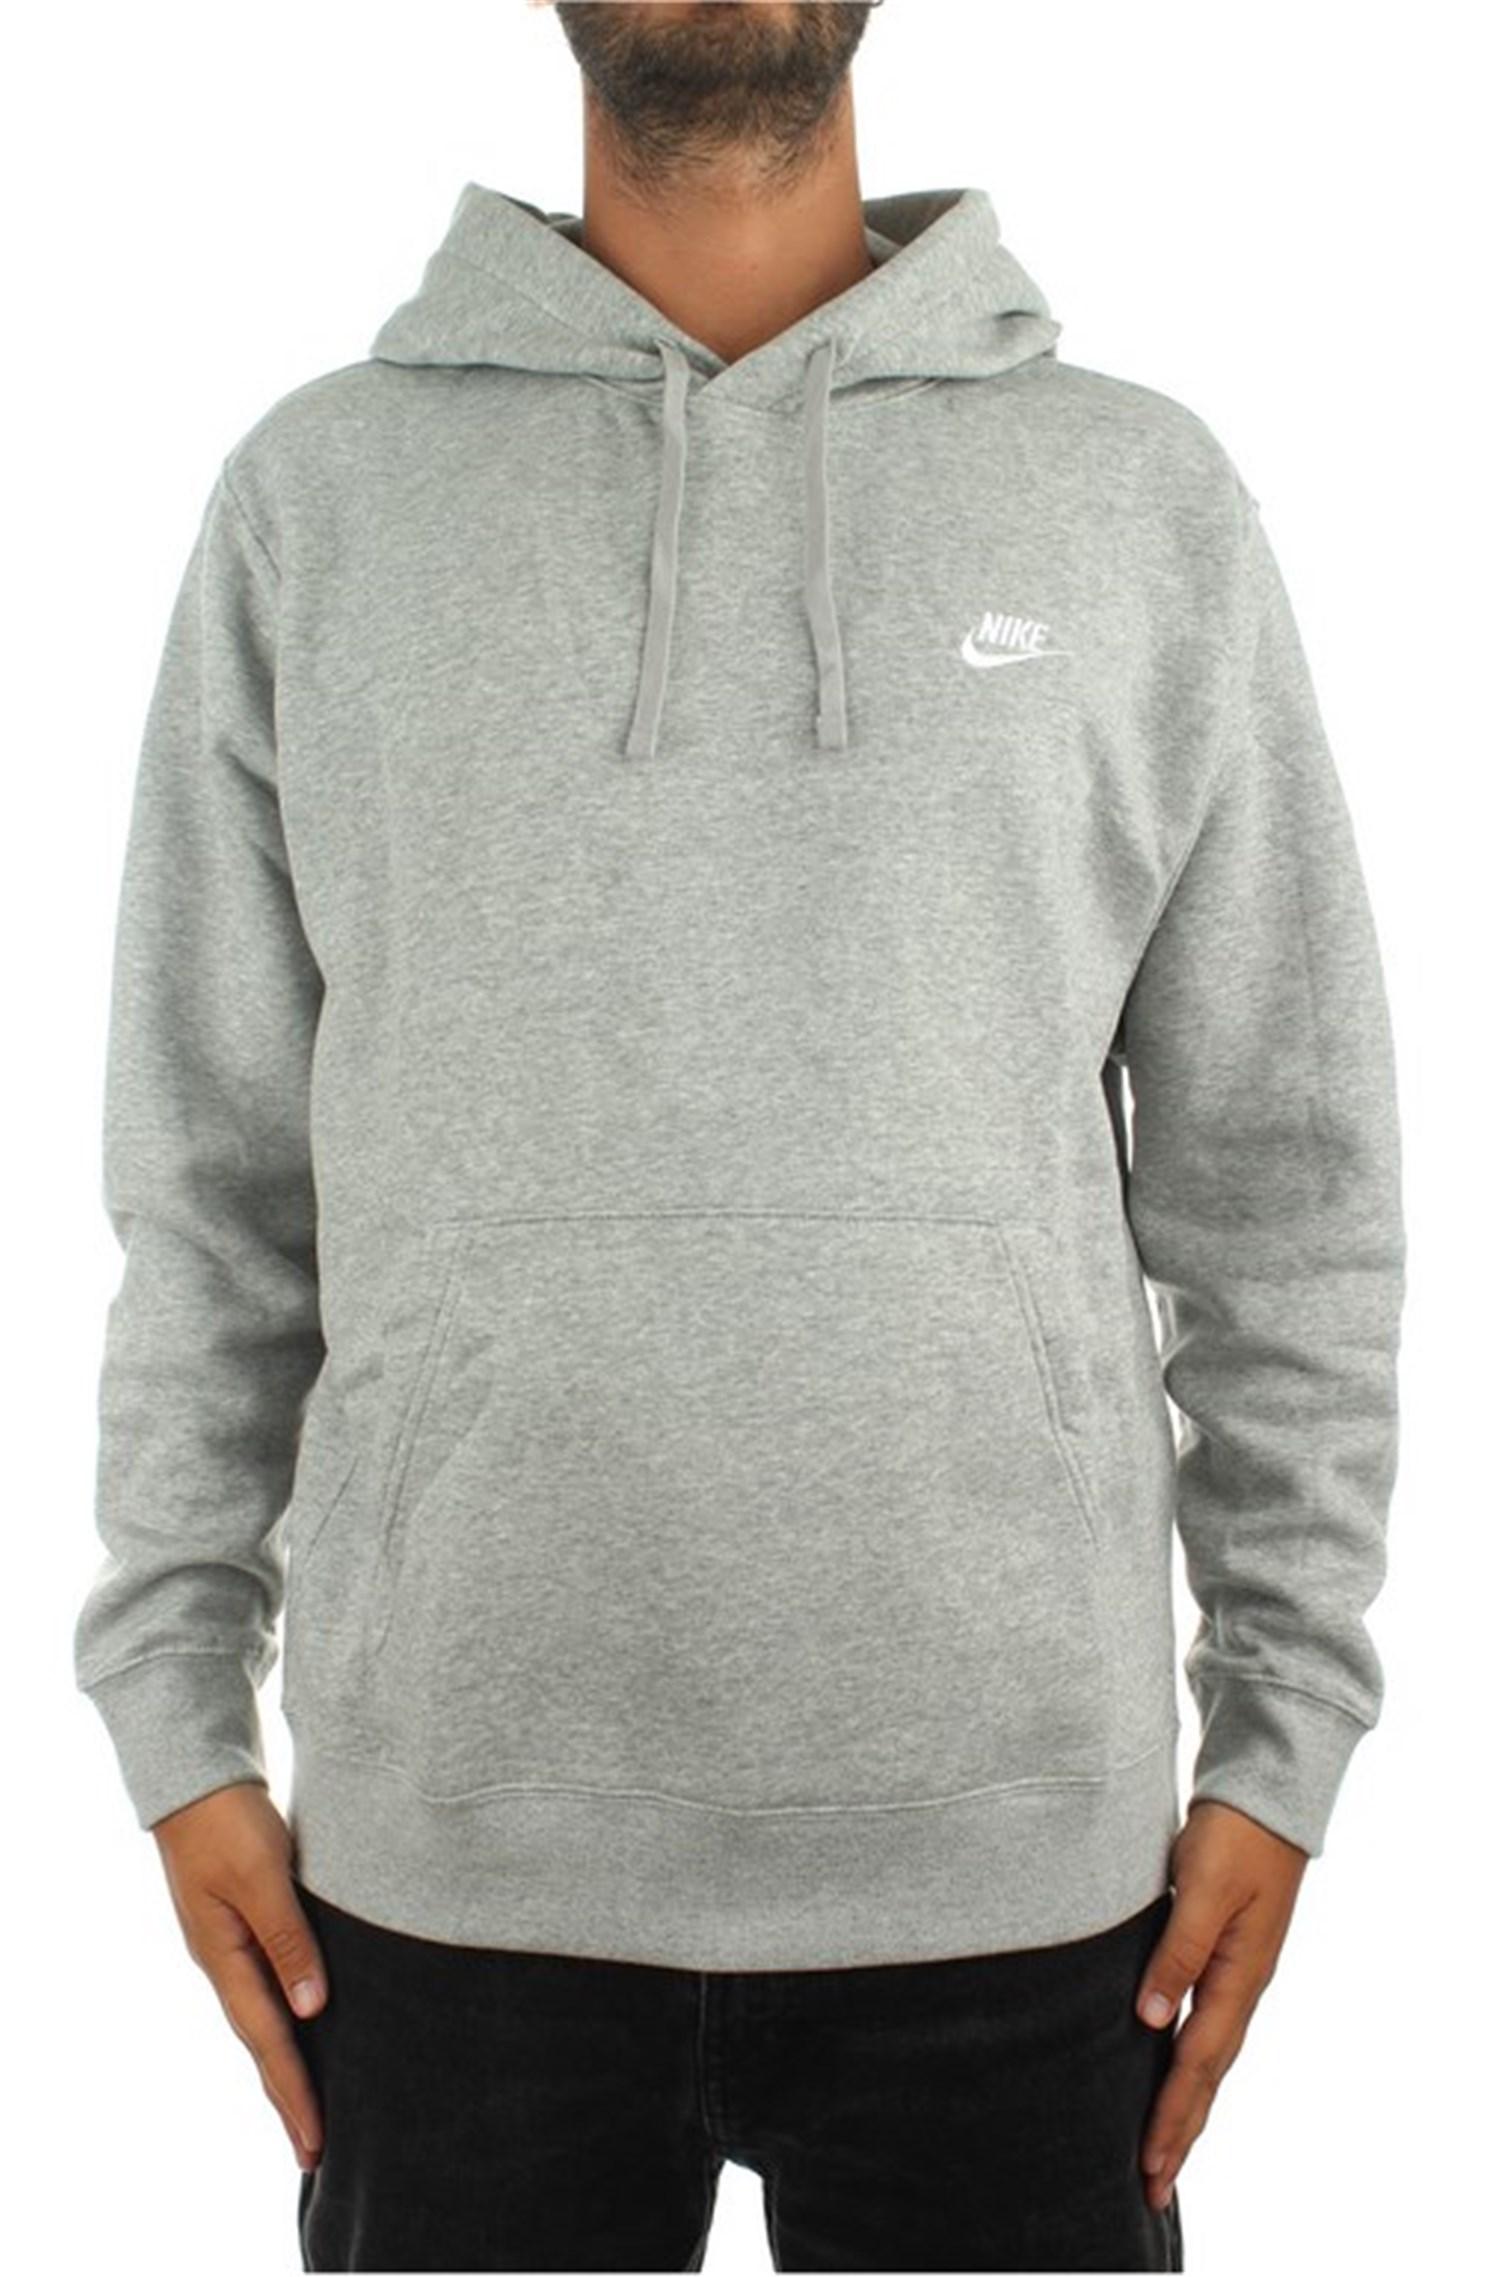 Nike Sweatshirts Hooded Man Dk Gray Heather / matte Silver / white